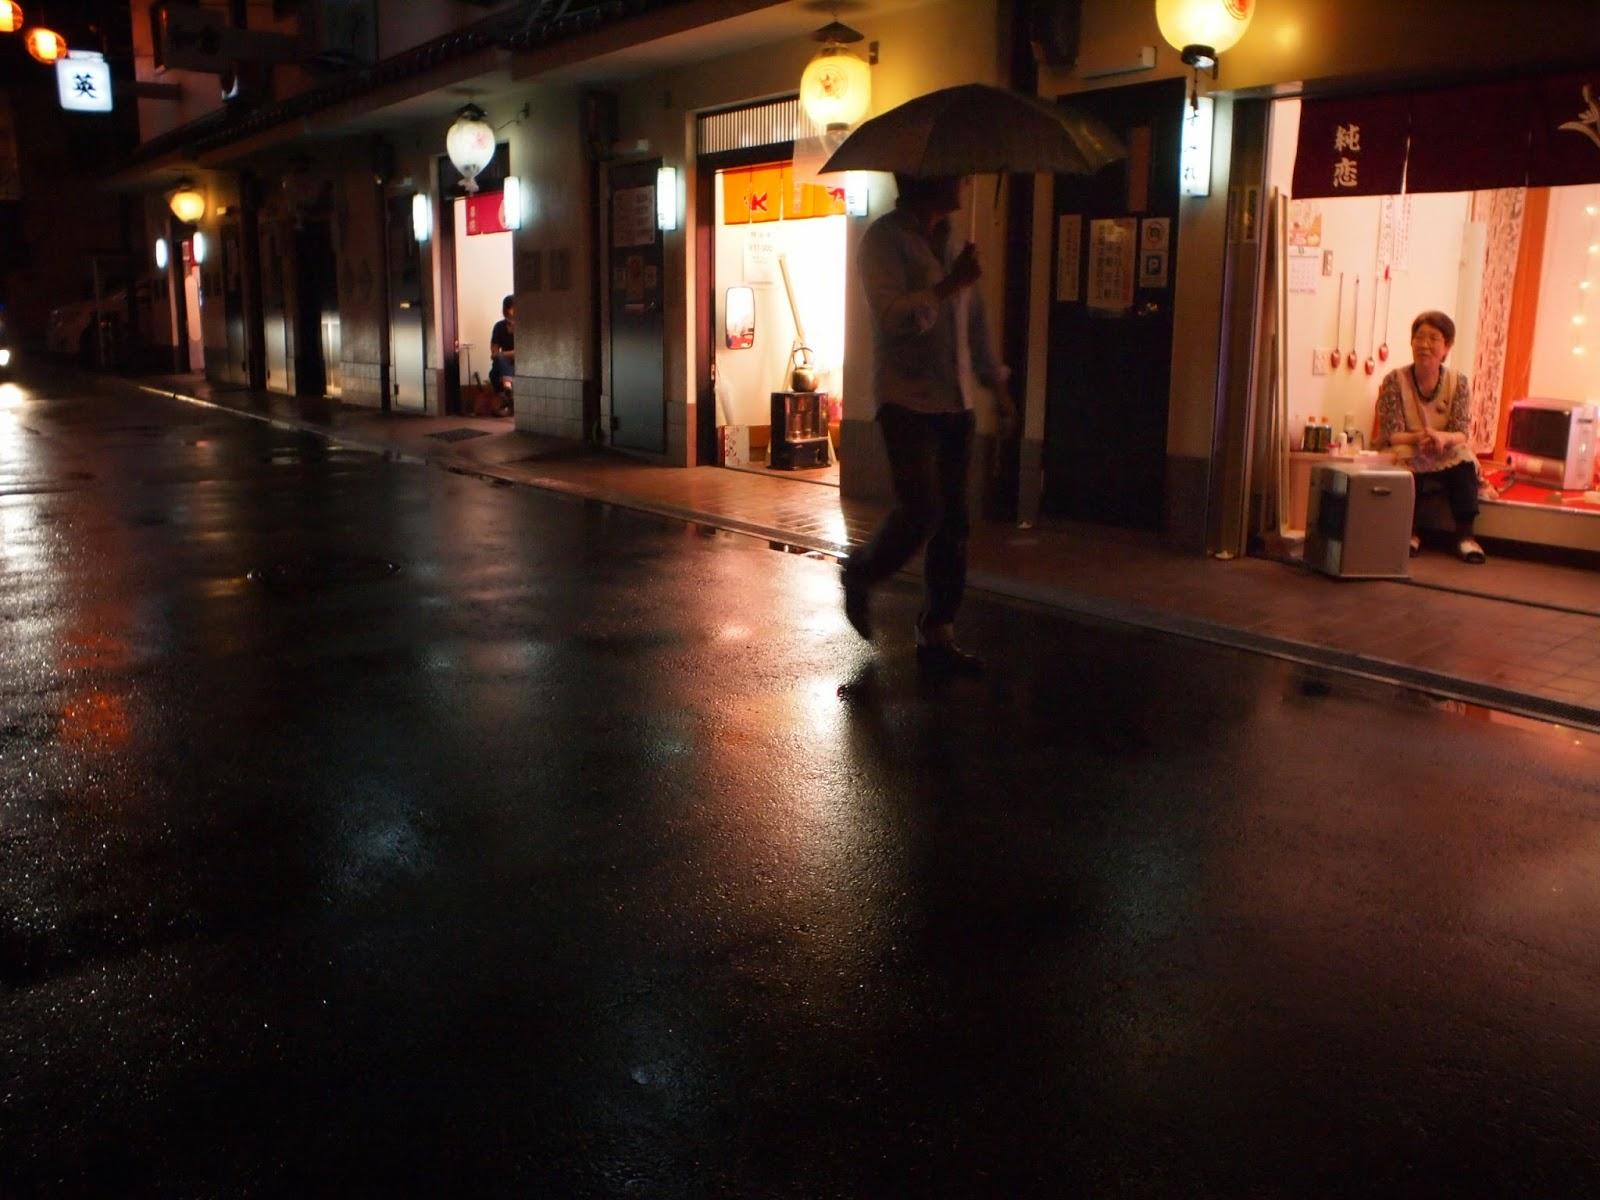 Trekking Japan: Osaka Red Light District